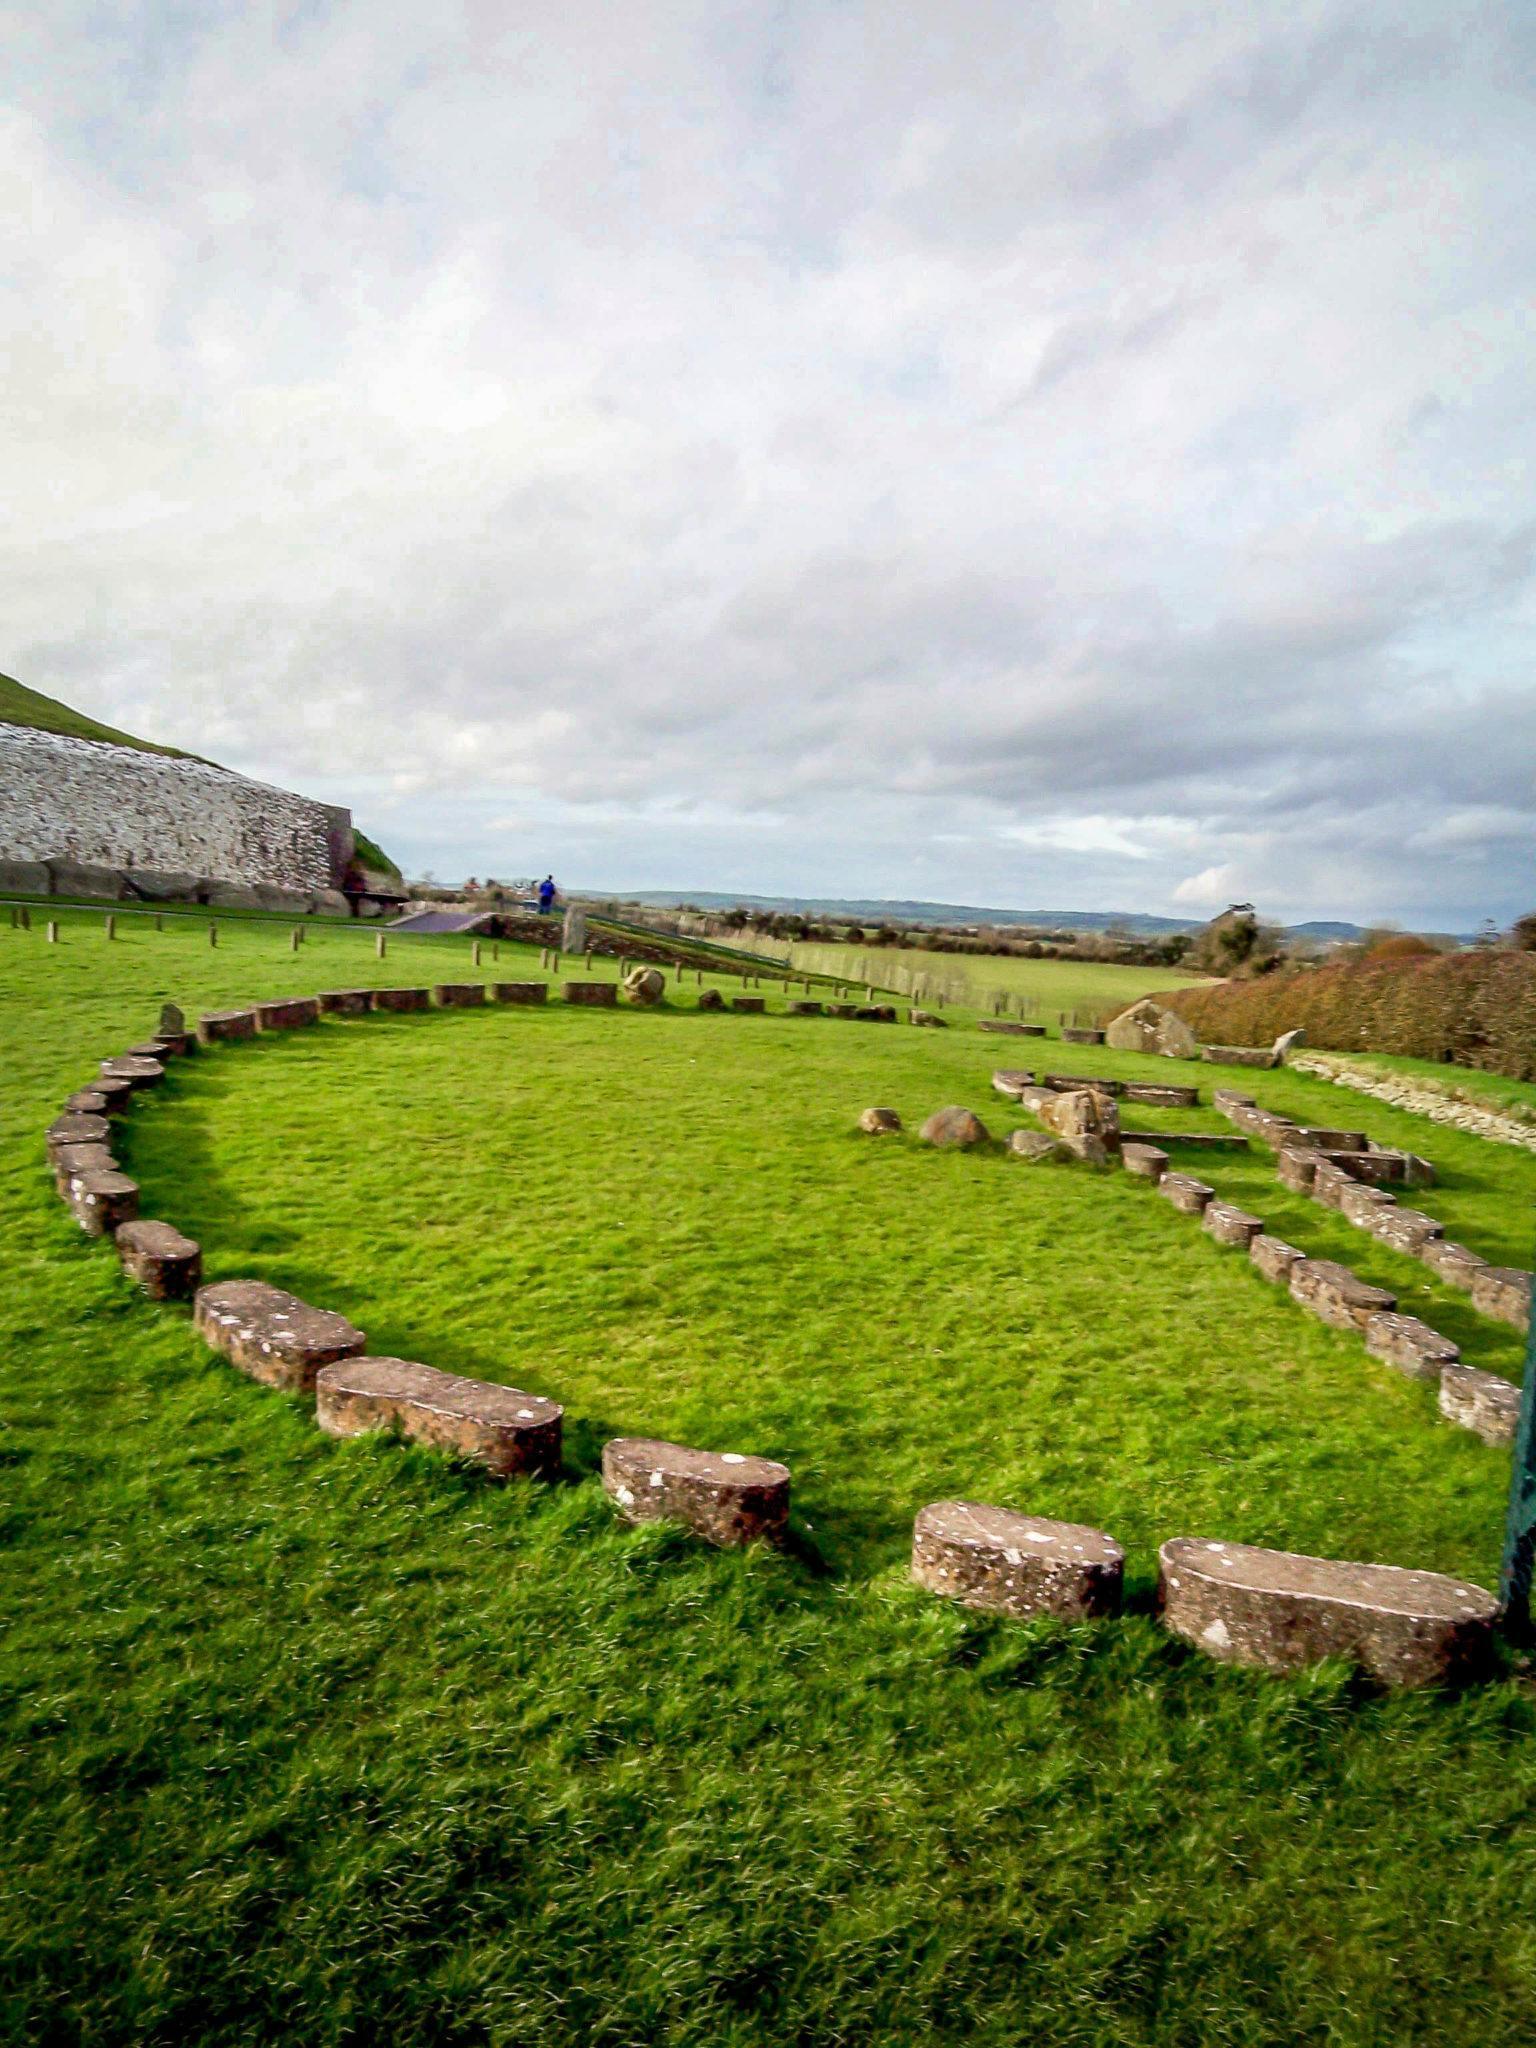 Stone outline on hillside near Newgrange passage tomb